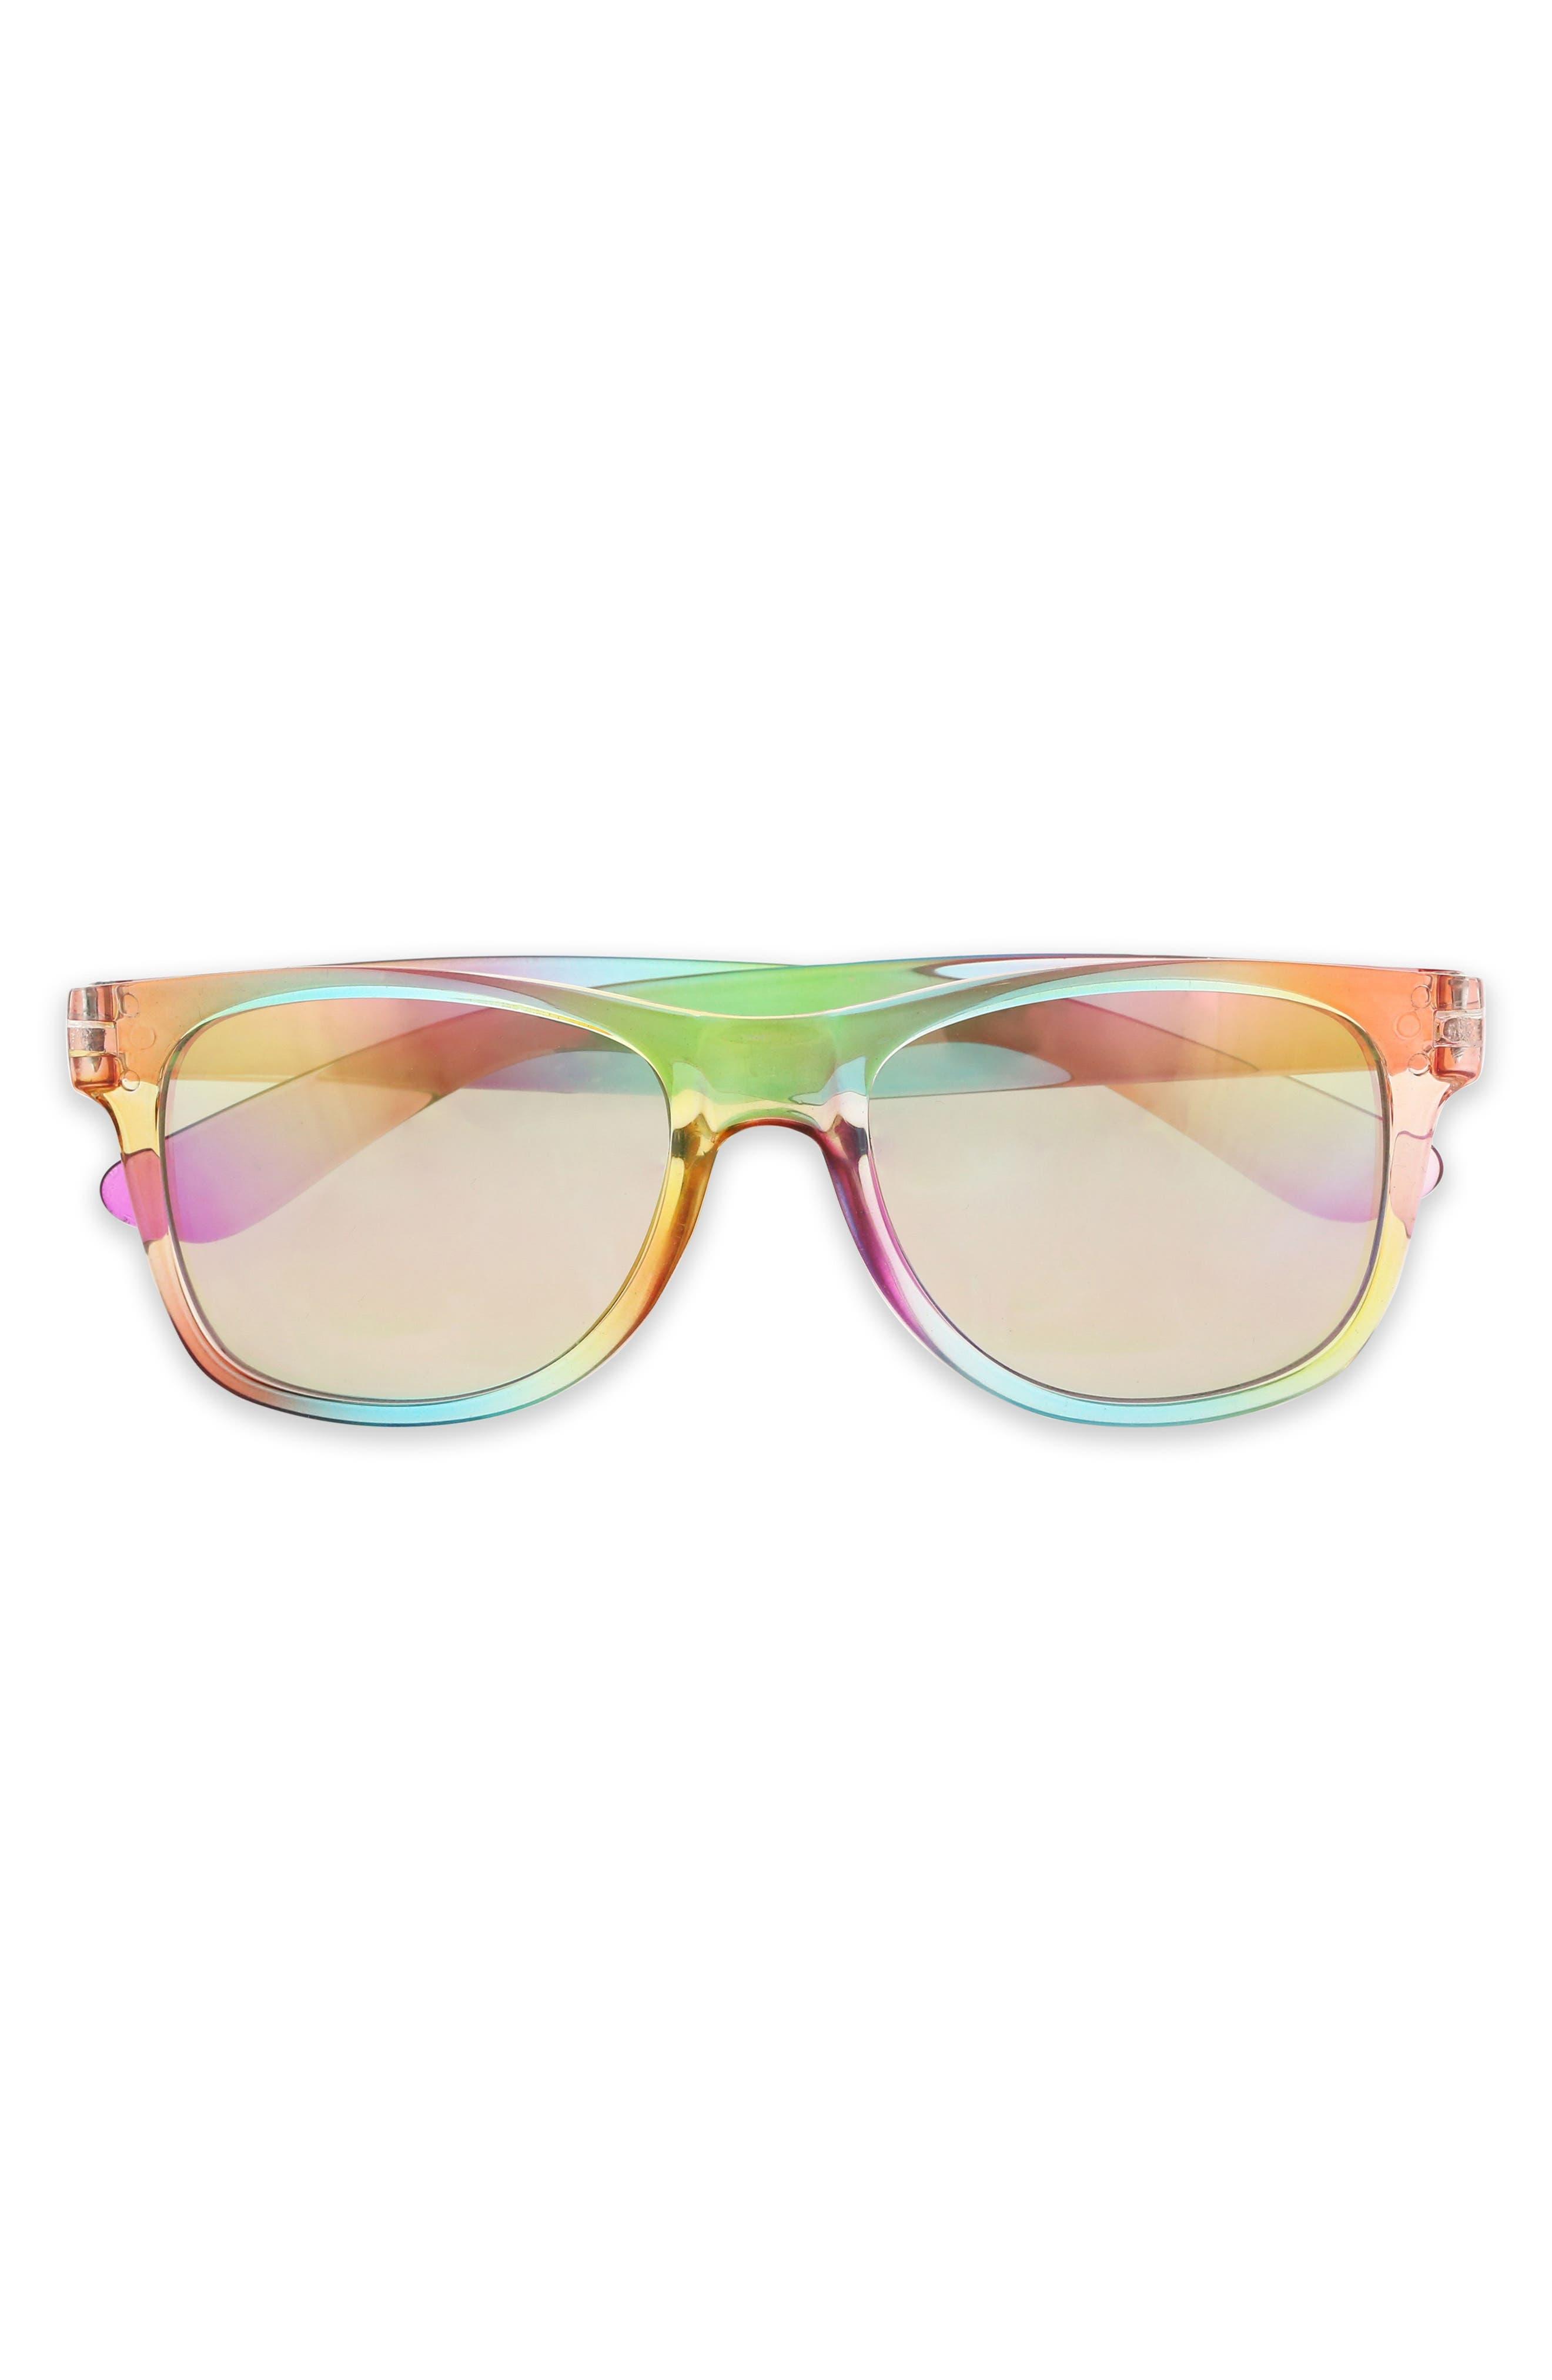 60mm Mirrored Sunglasses,                             Main thumbnail 1, color,                             305